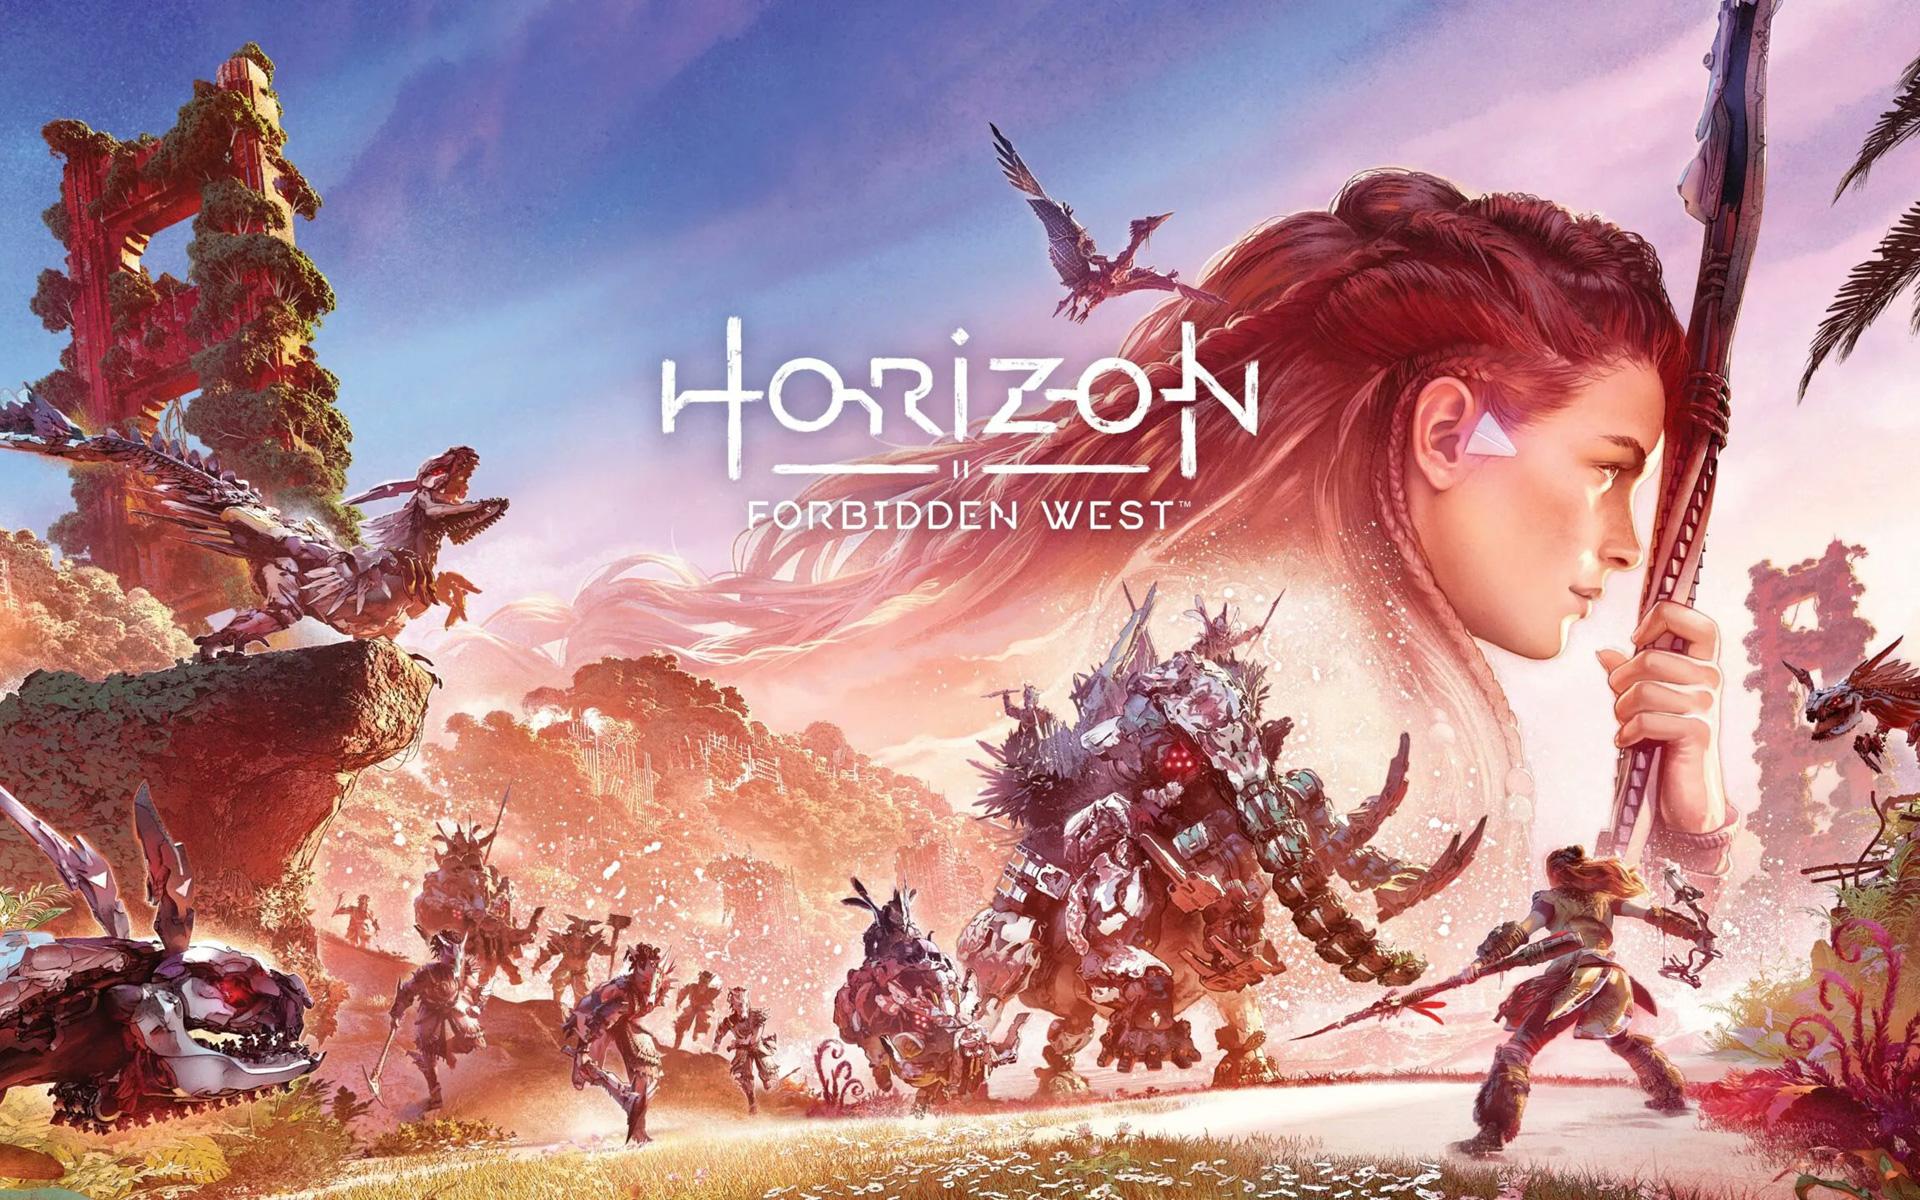 Free Horizon: Forbidden West Wallpaper in 1920x1200